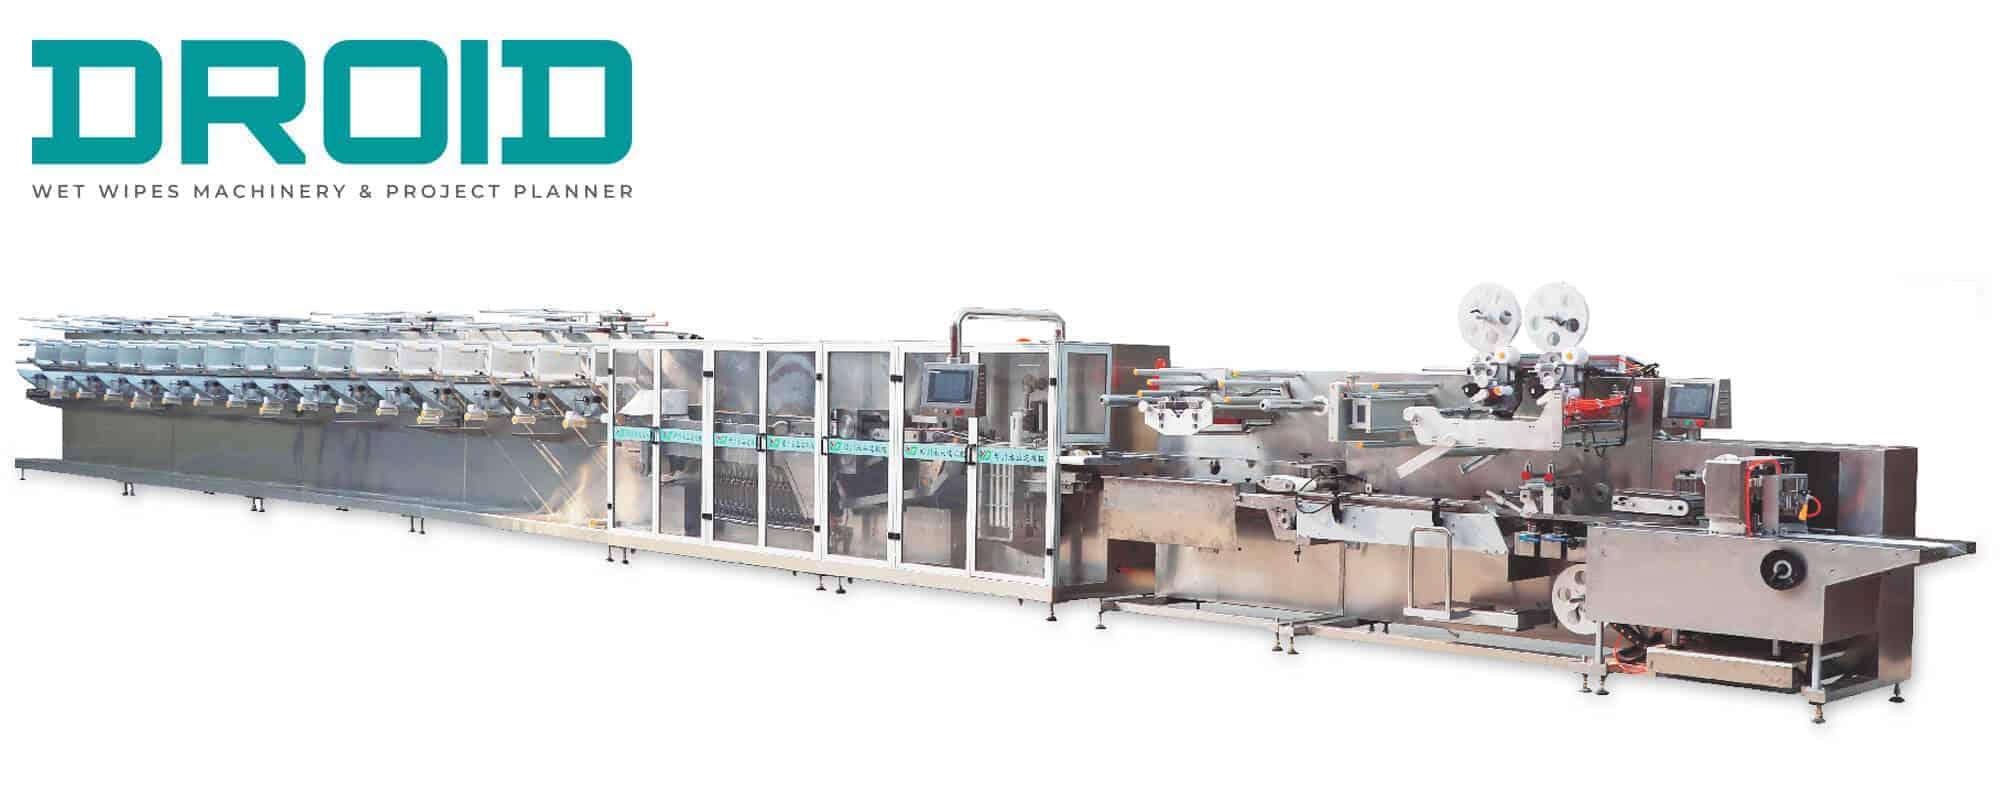 UT BM1620 Flow pack wet wipes converting machine and packaging machine - Wet Wipes Machine Products